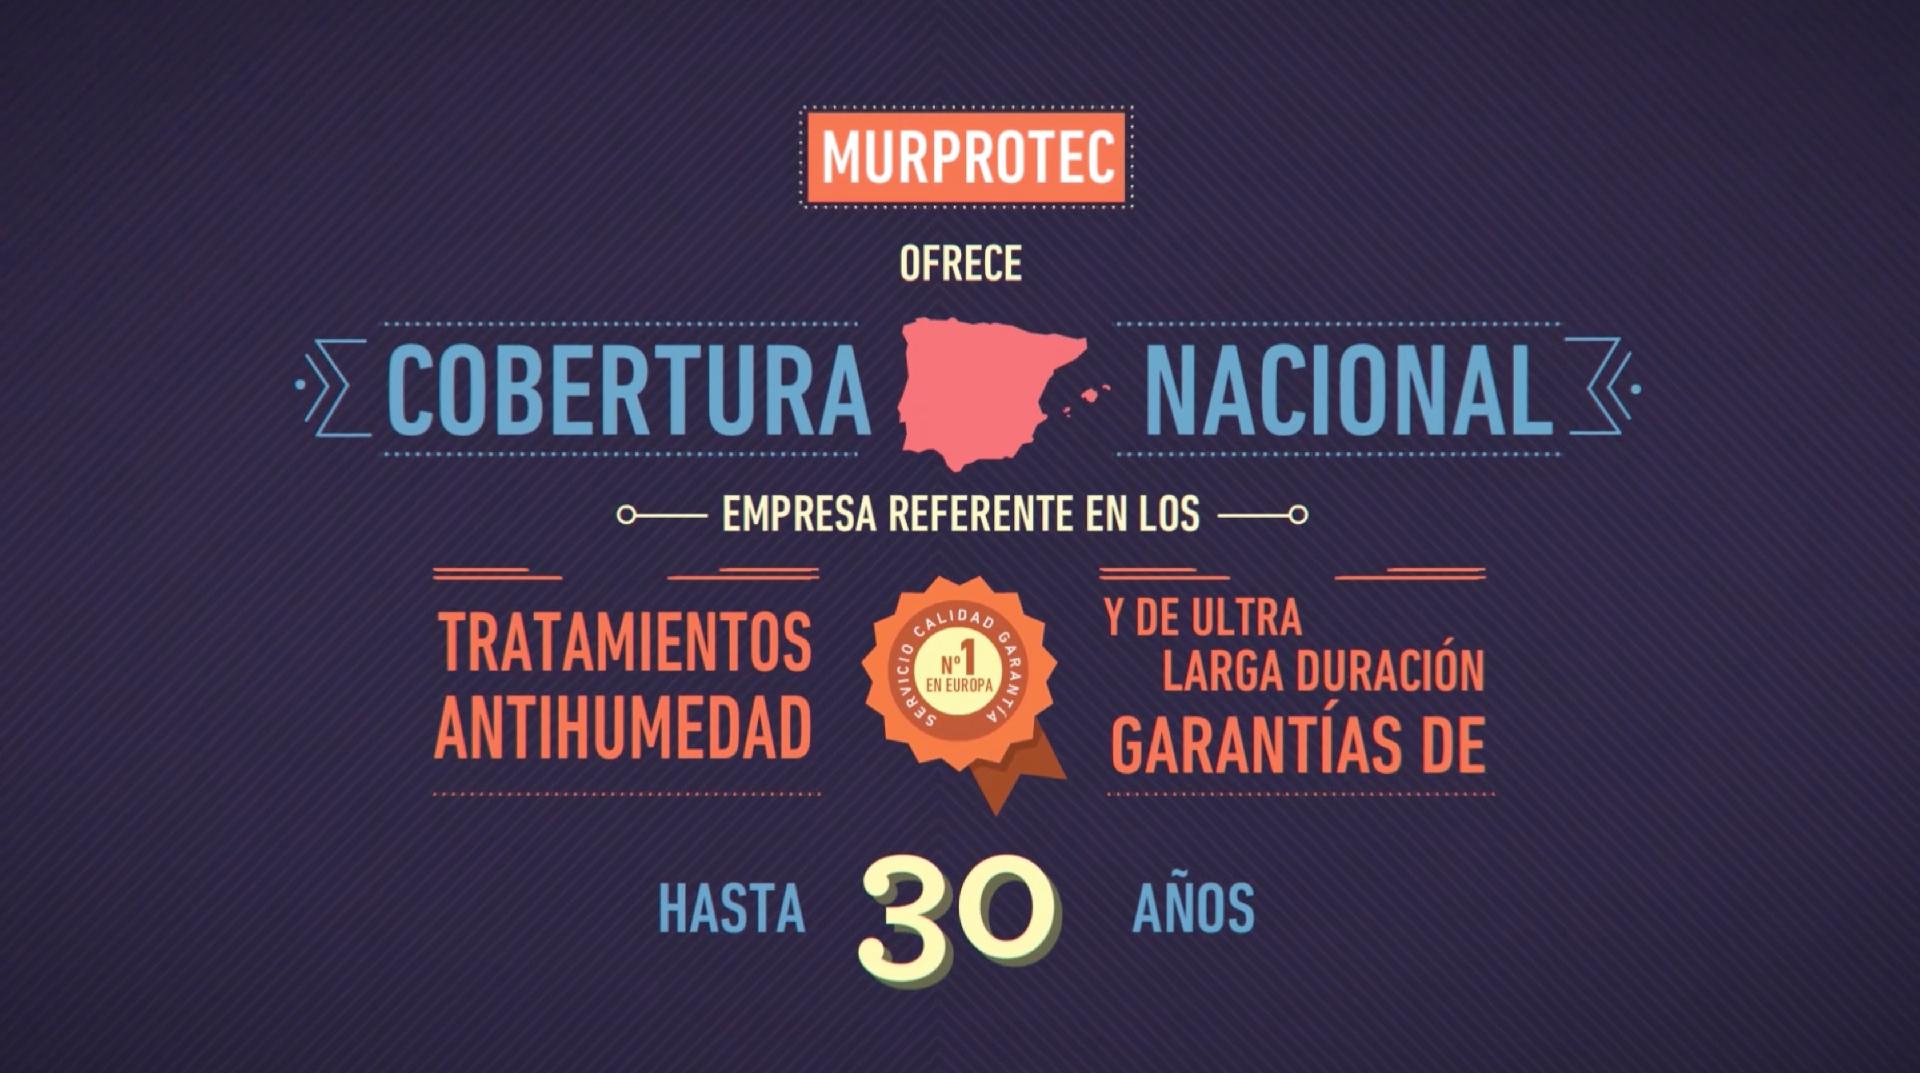 murprotec_coberturanacional